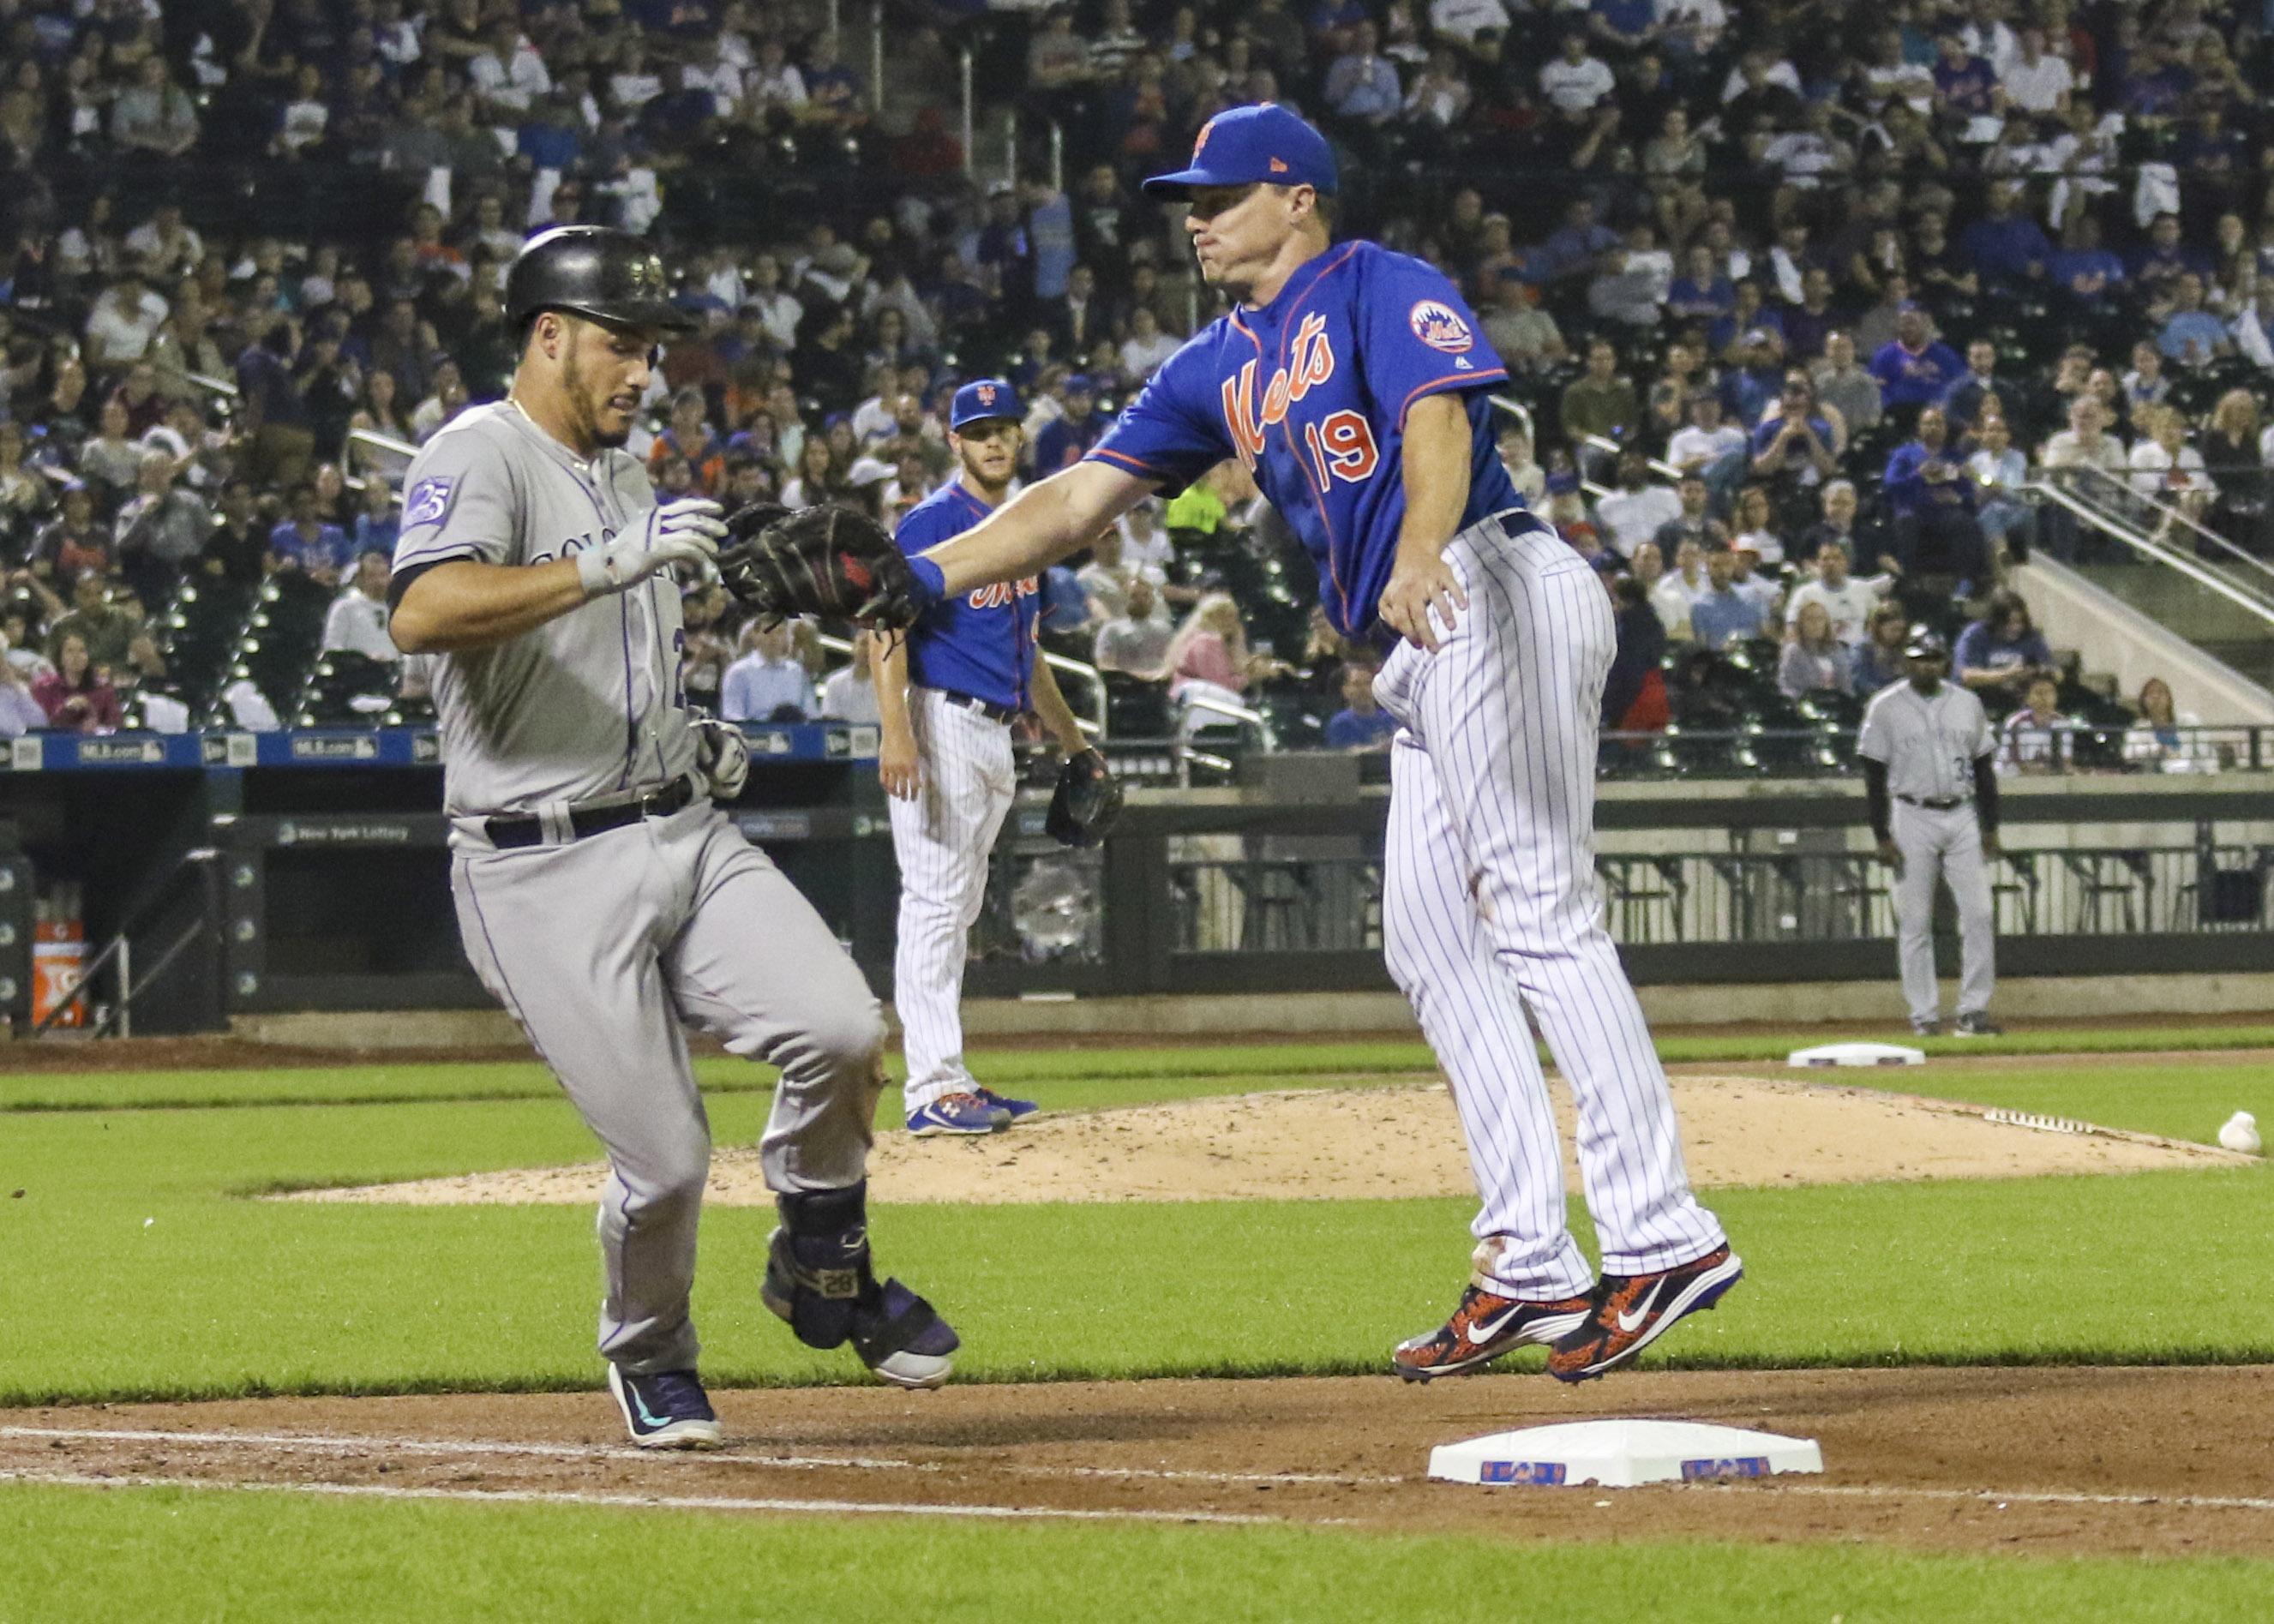 5/5/18 Game Preview: Colorado Rockies at New York Mets